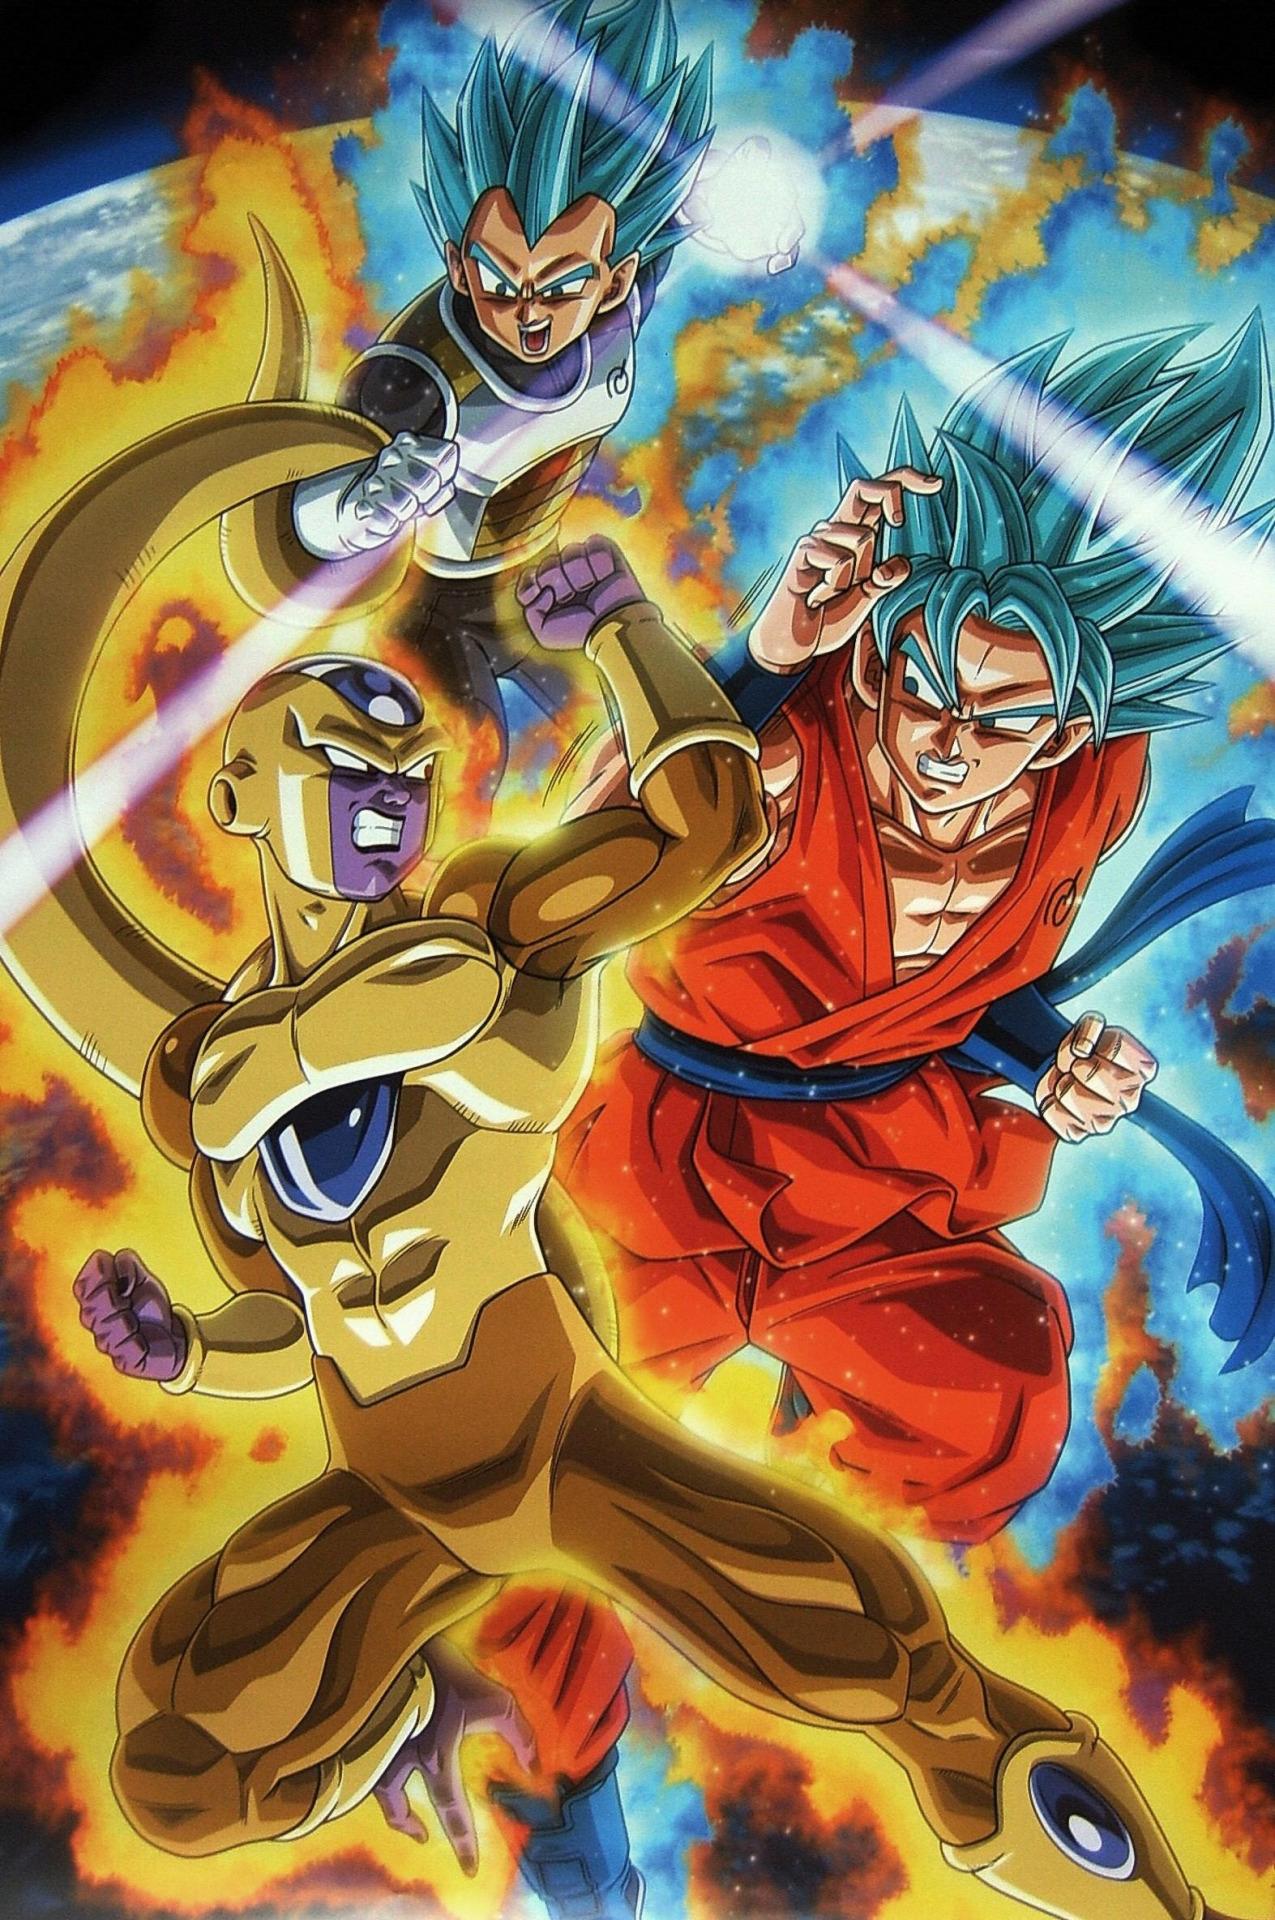 dragon ball Goku_and_Vegeta_vs_Frieza